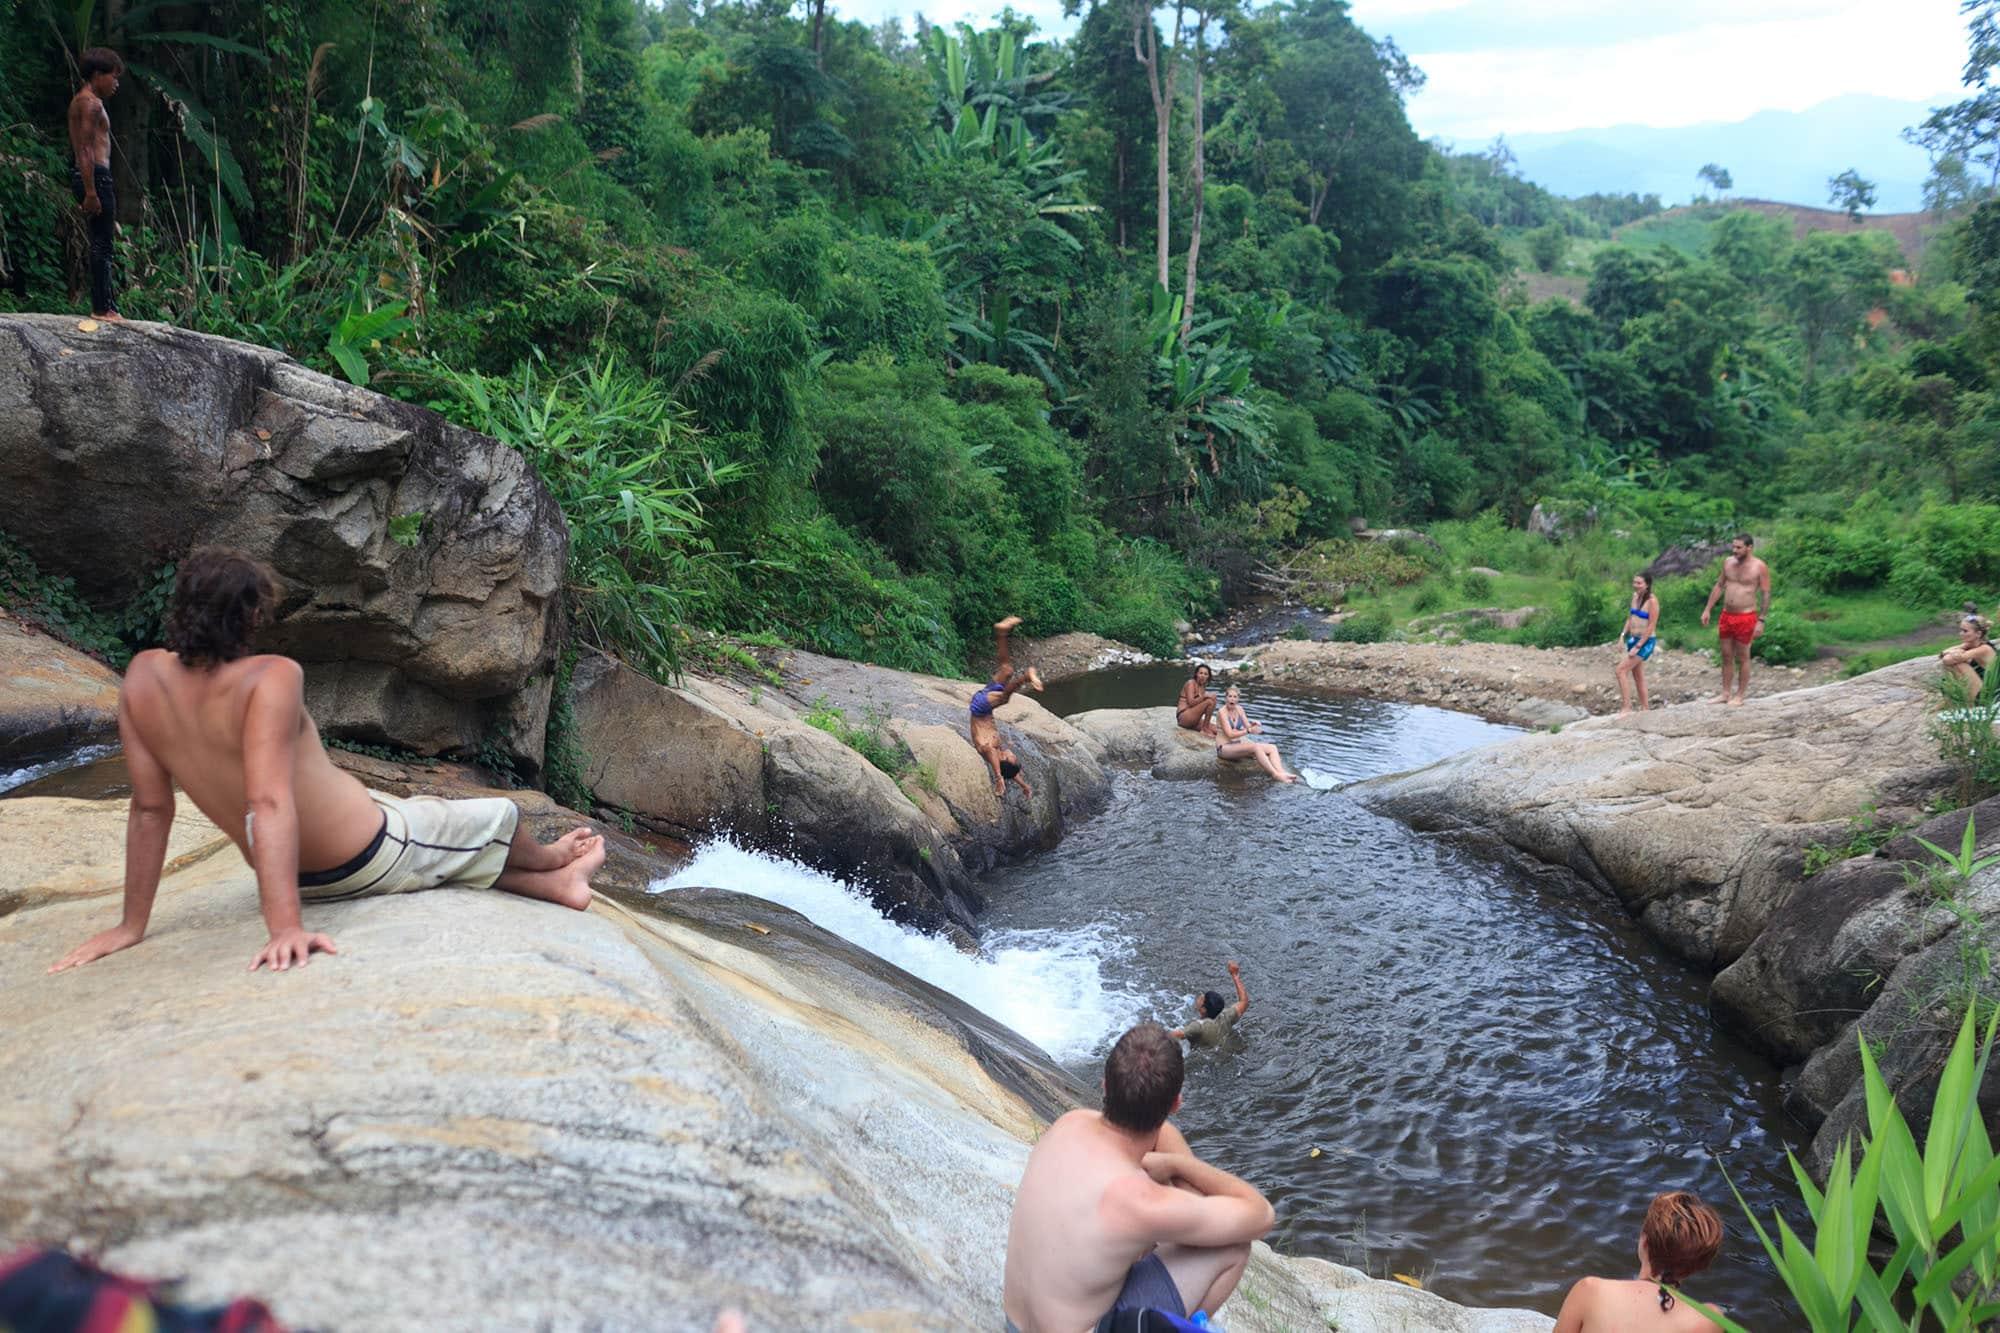 Mor Paeng Waterfall in Pai, Thailand